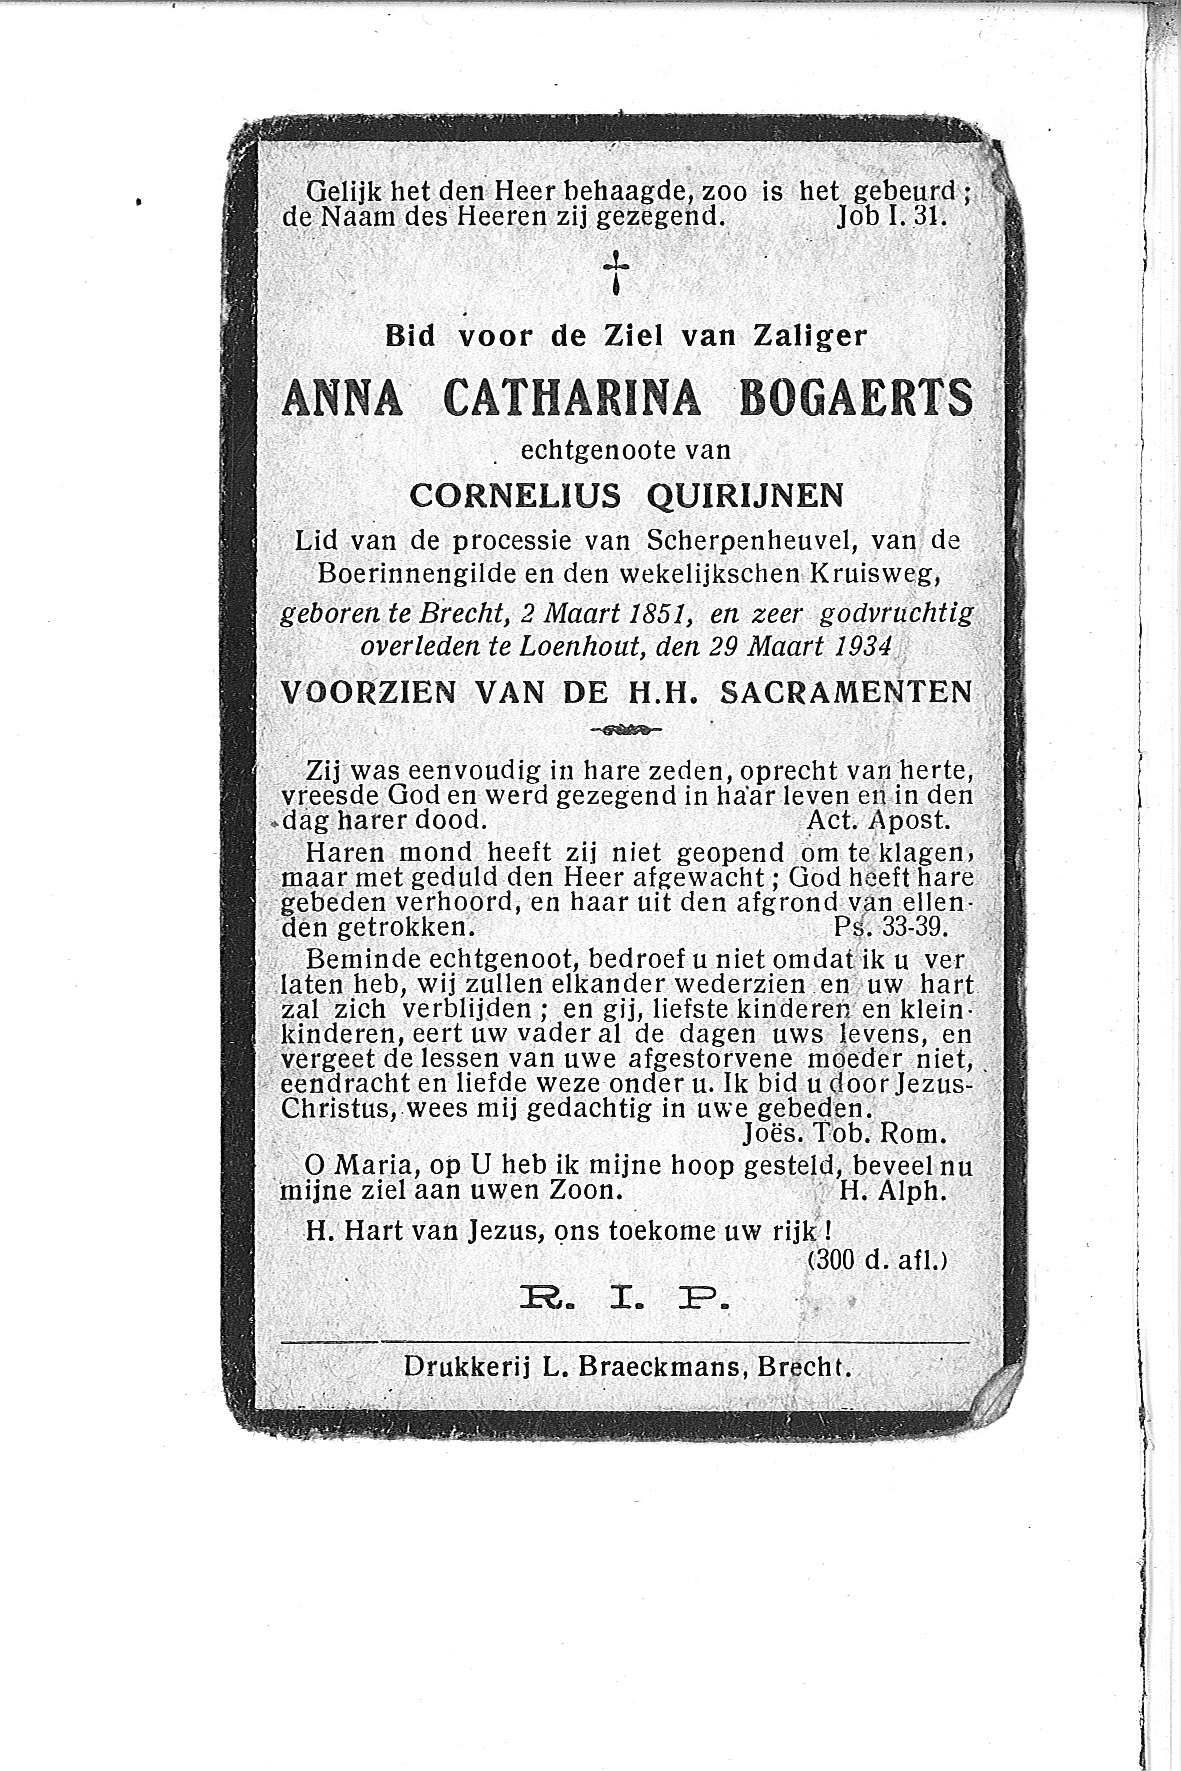 Anna-Catharina(1934)20110316145057_00010.jpg